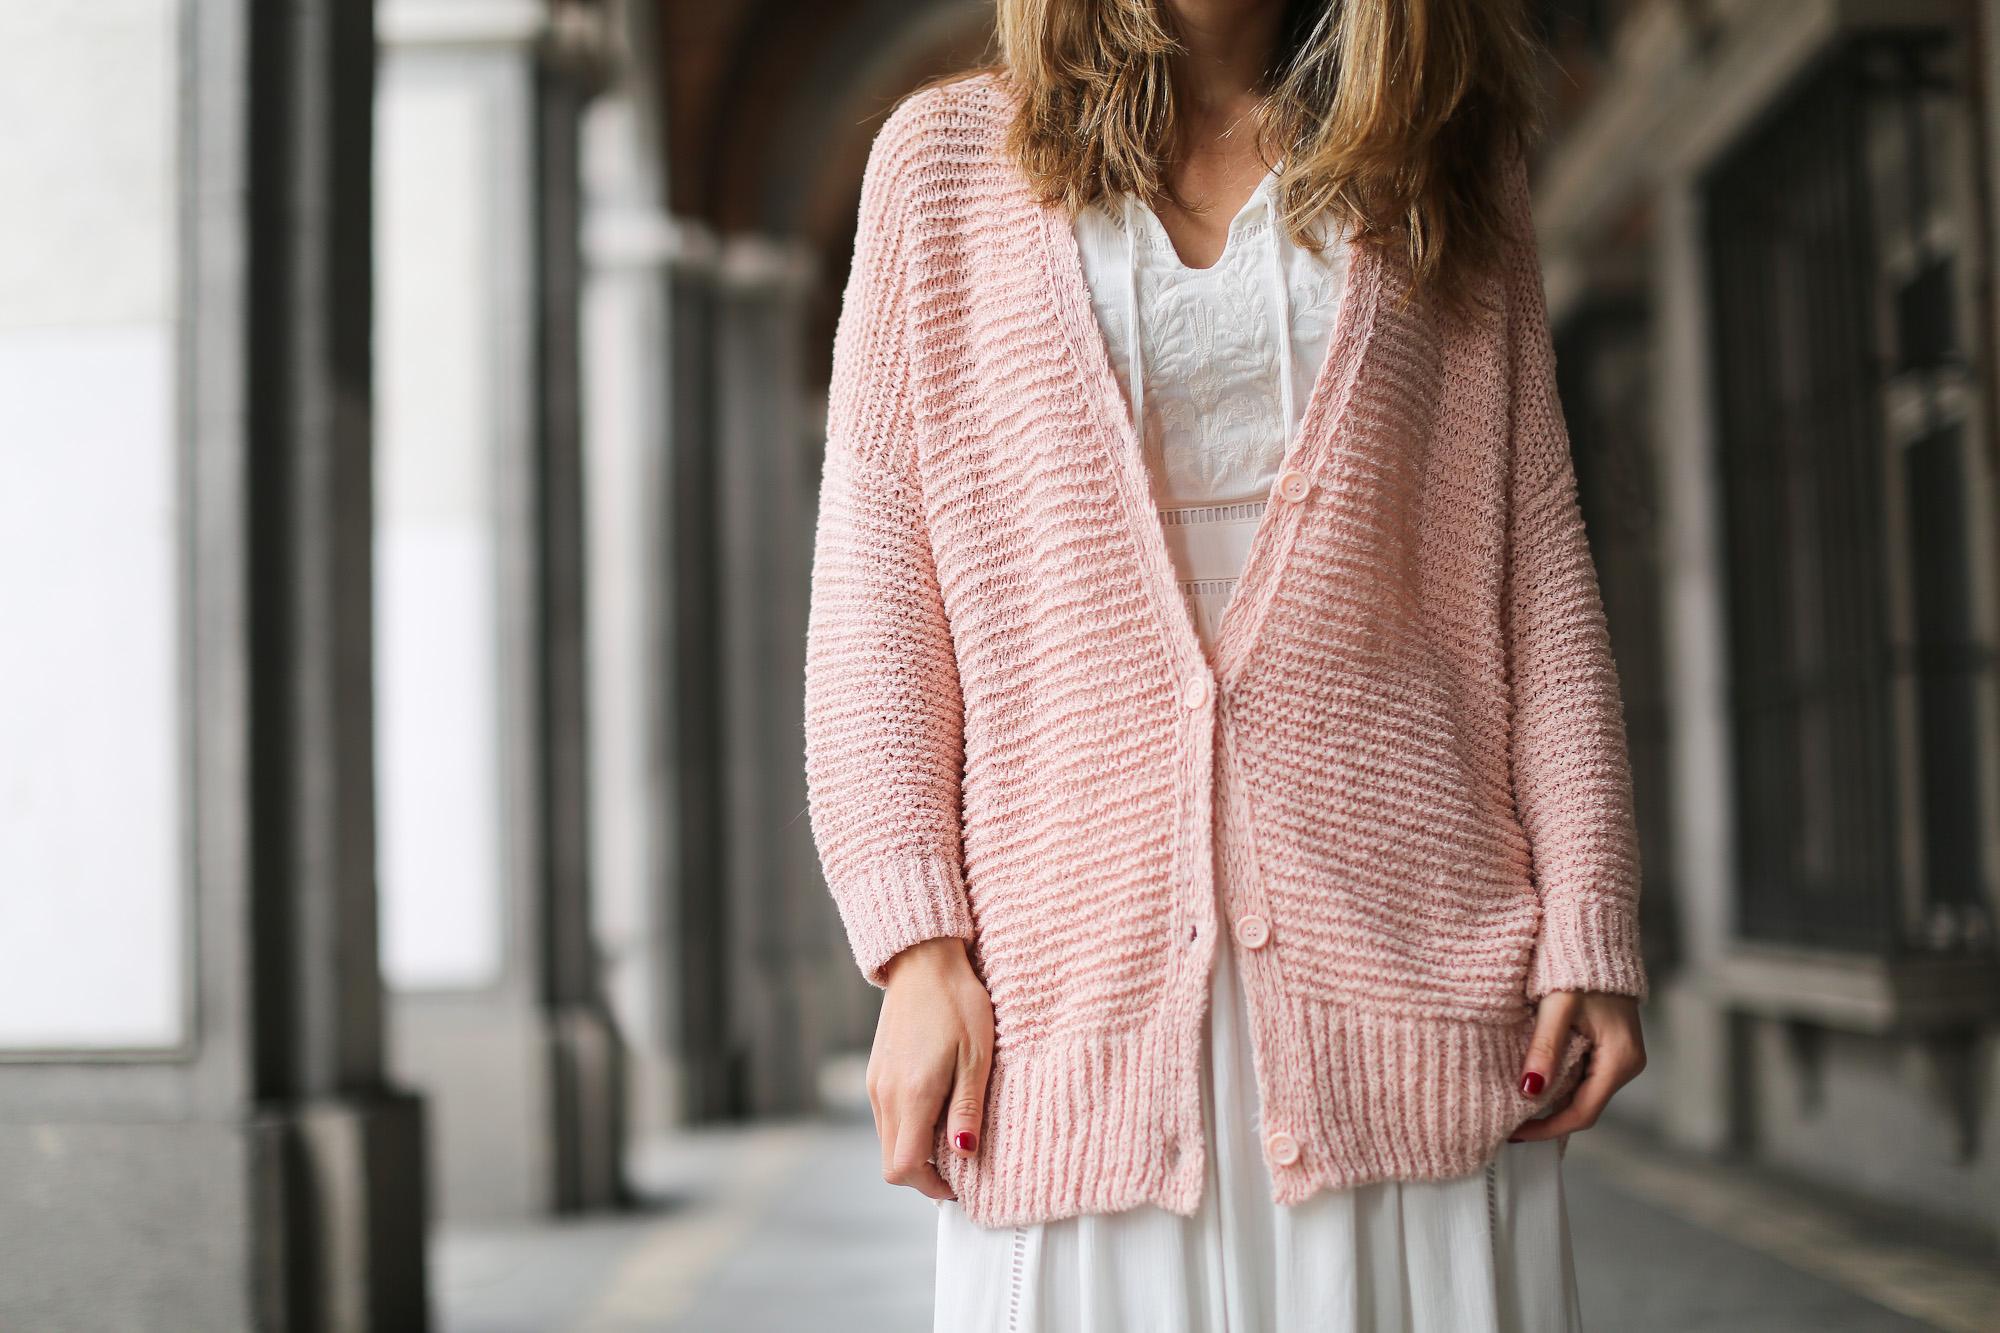 Clochet_streetstyle_lookiero_americanvintage_nude_cardigan_vila_white_boho_Dress